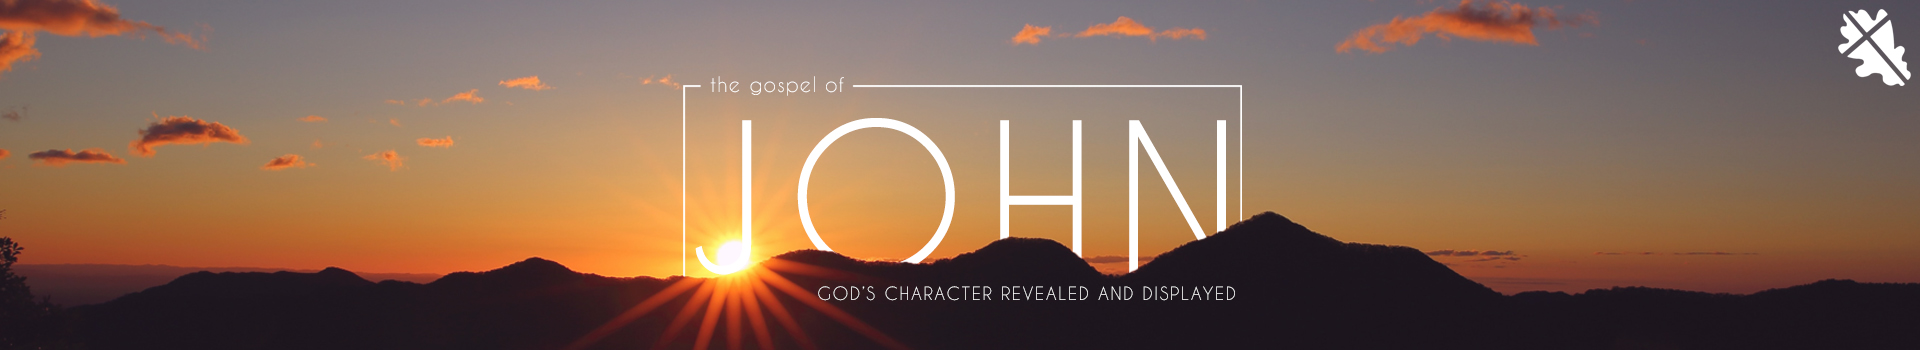 John_Sermon_Series